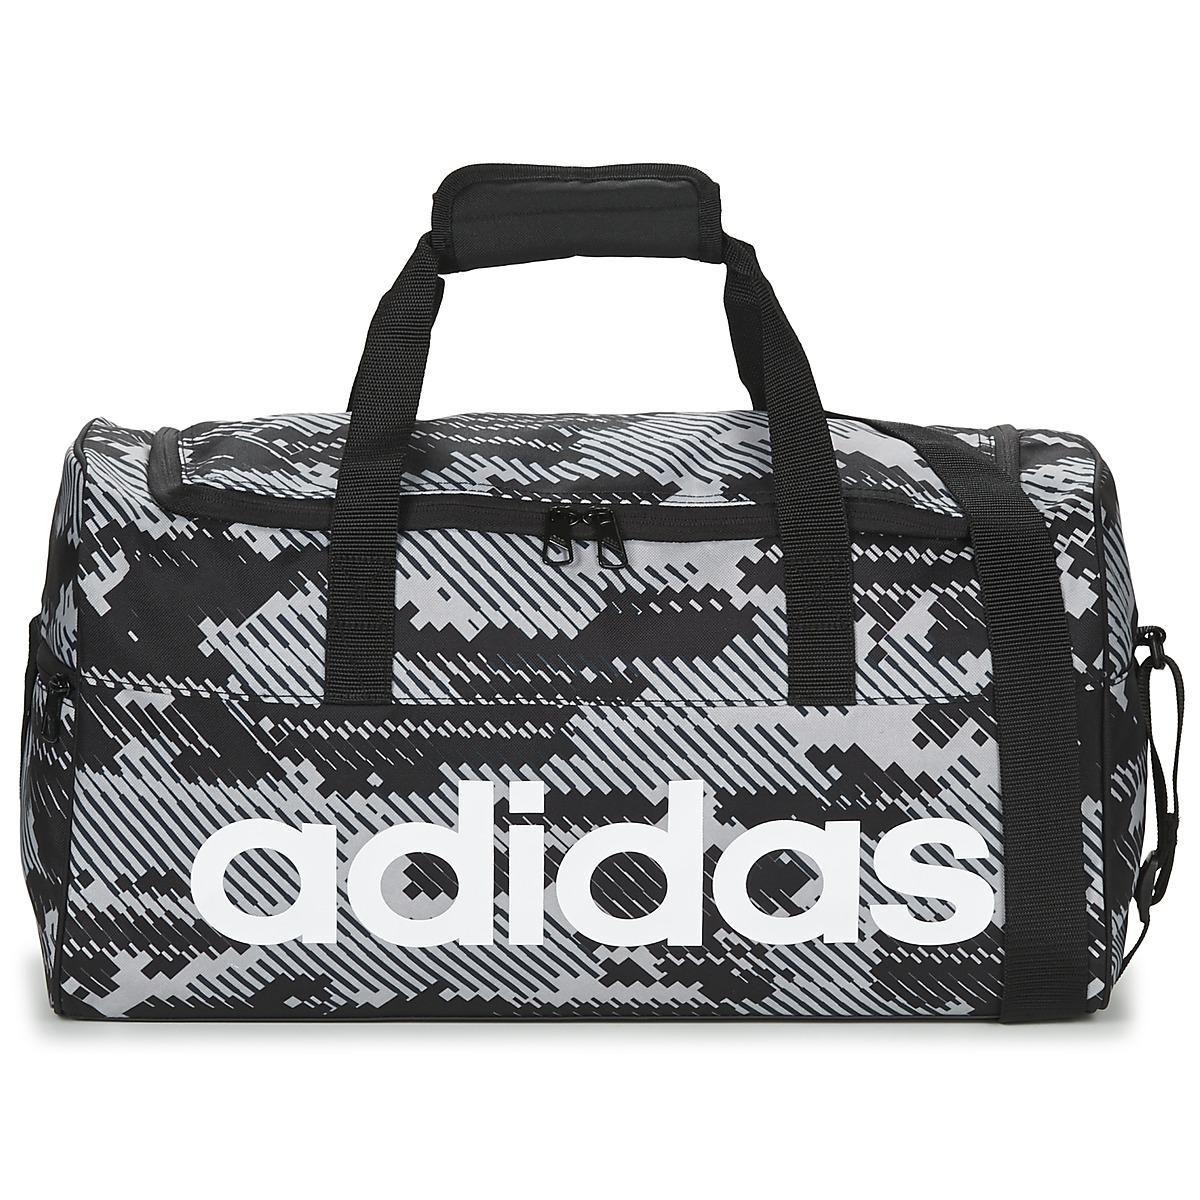 c28ddd62d8de Adidas Originals Linear Teambag Small Men s Sports Bag In Grey in ...